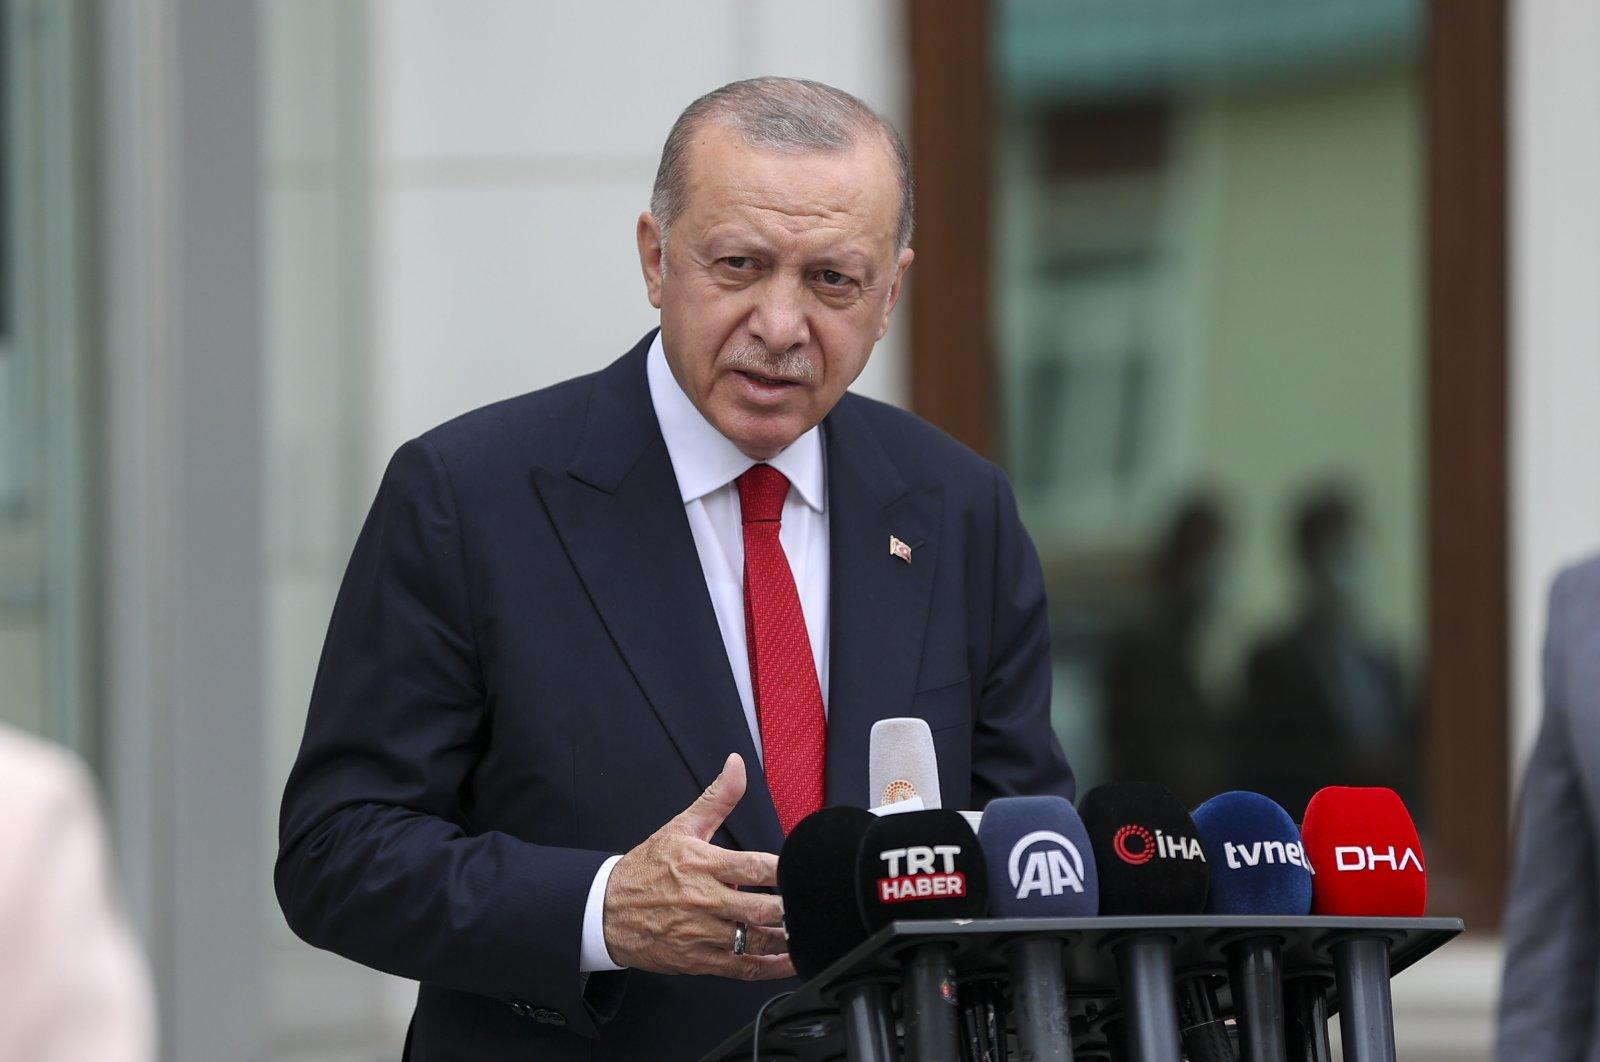 President Recep Tayyip Erdoğan speaks to the press after attending a prayer at Çilehane Mosque in Istanbul's Üsküdar, Turkey, Aug. 11, 2021 (AA Photo)